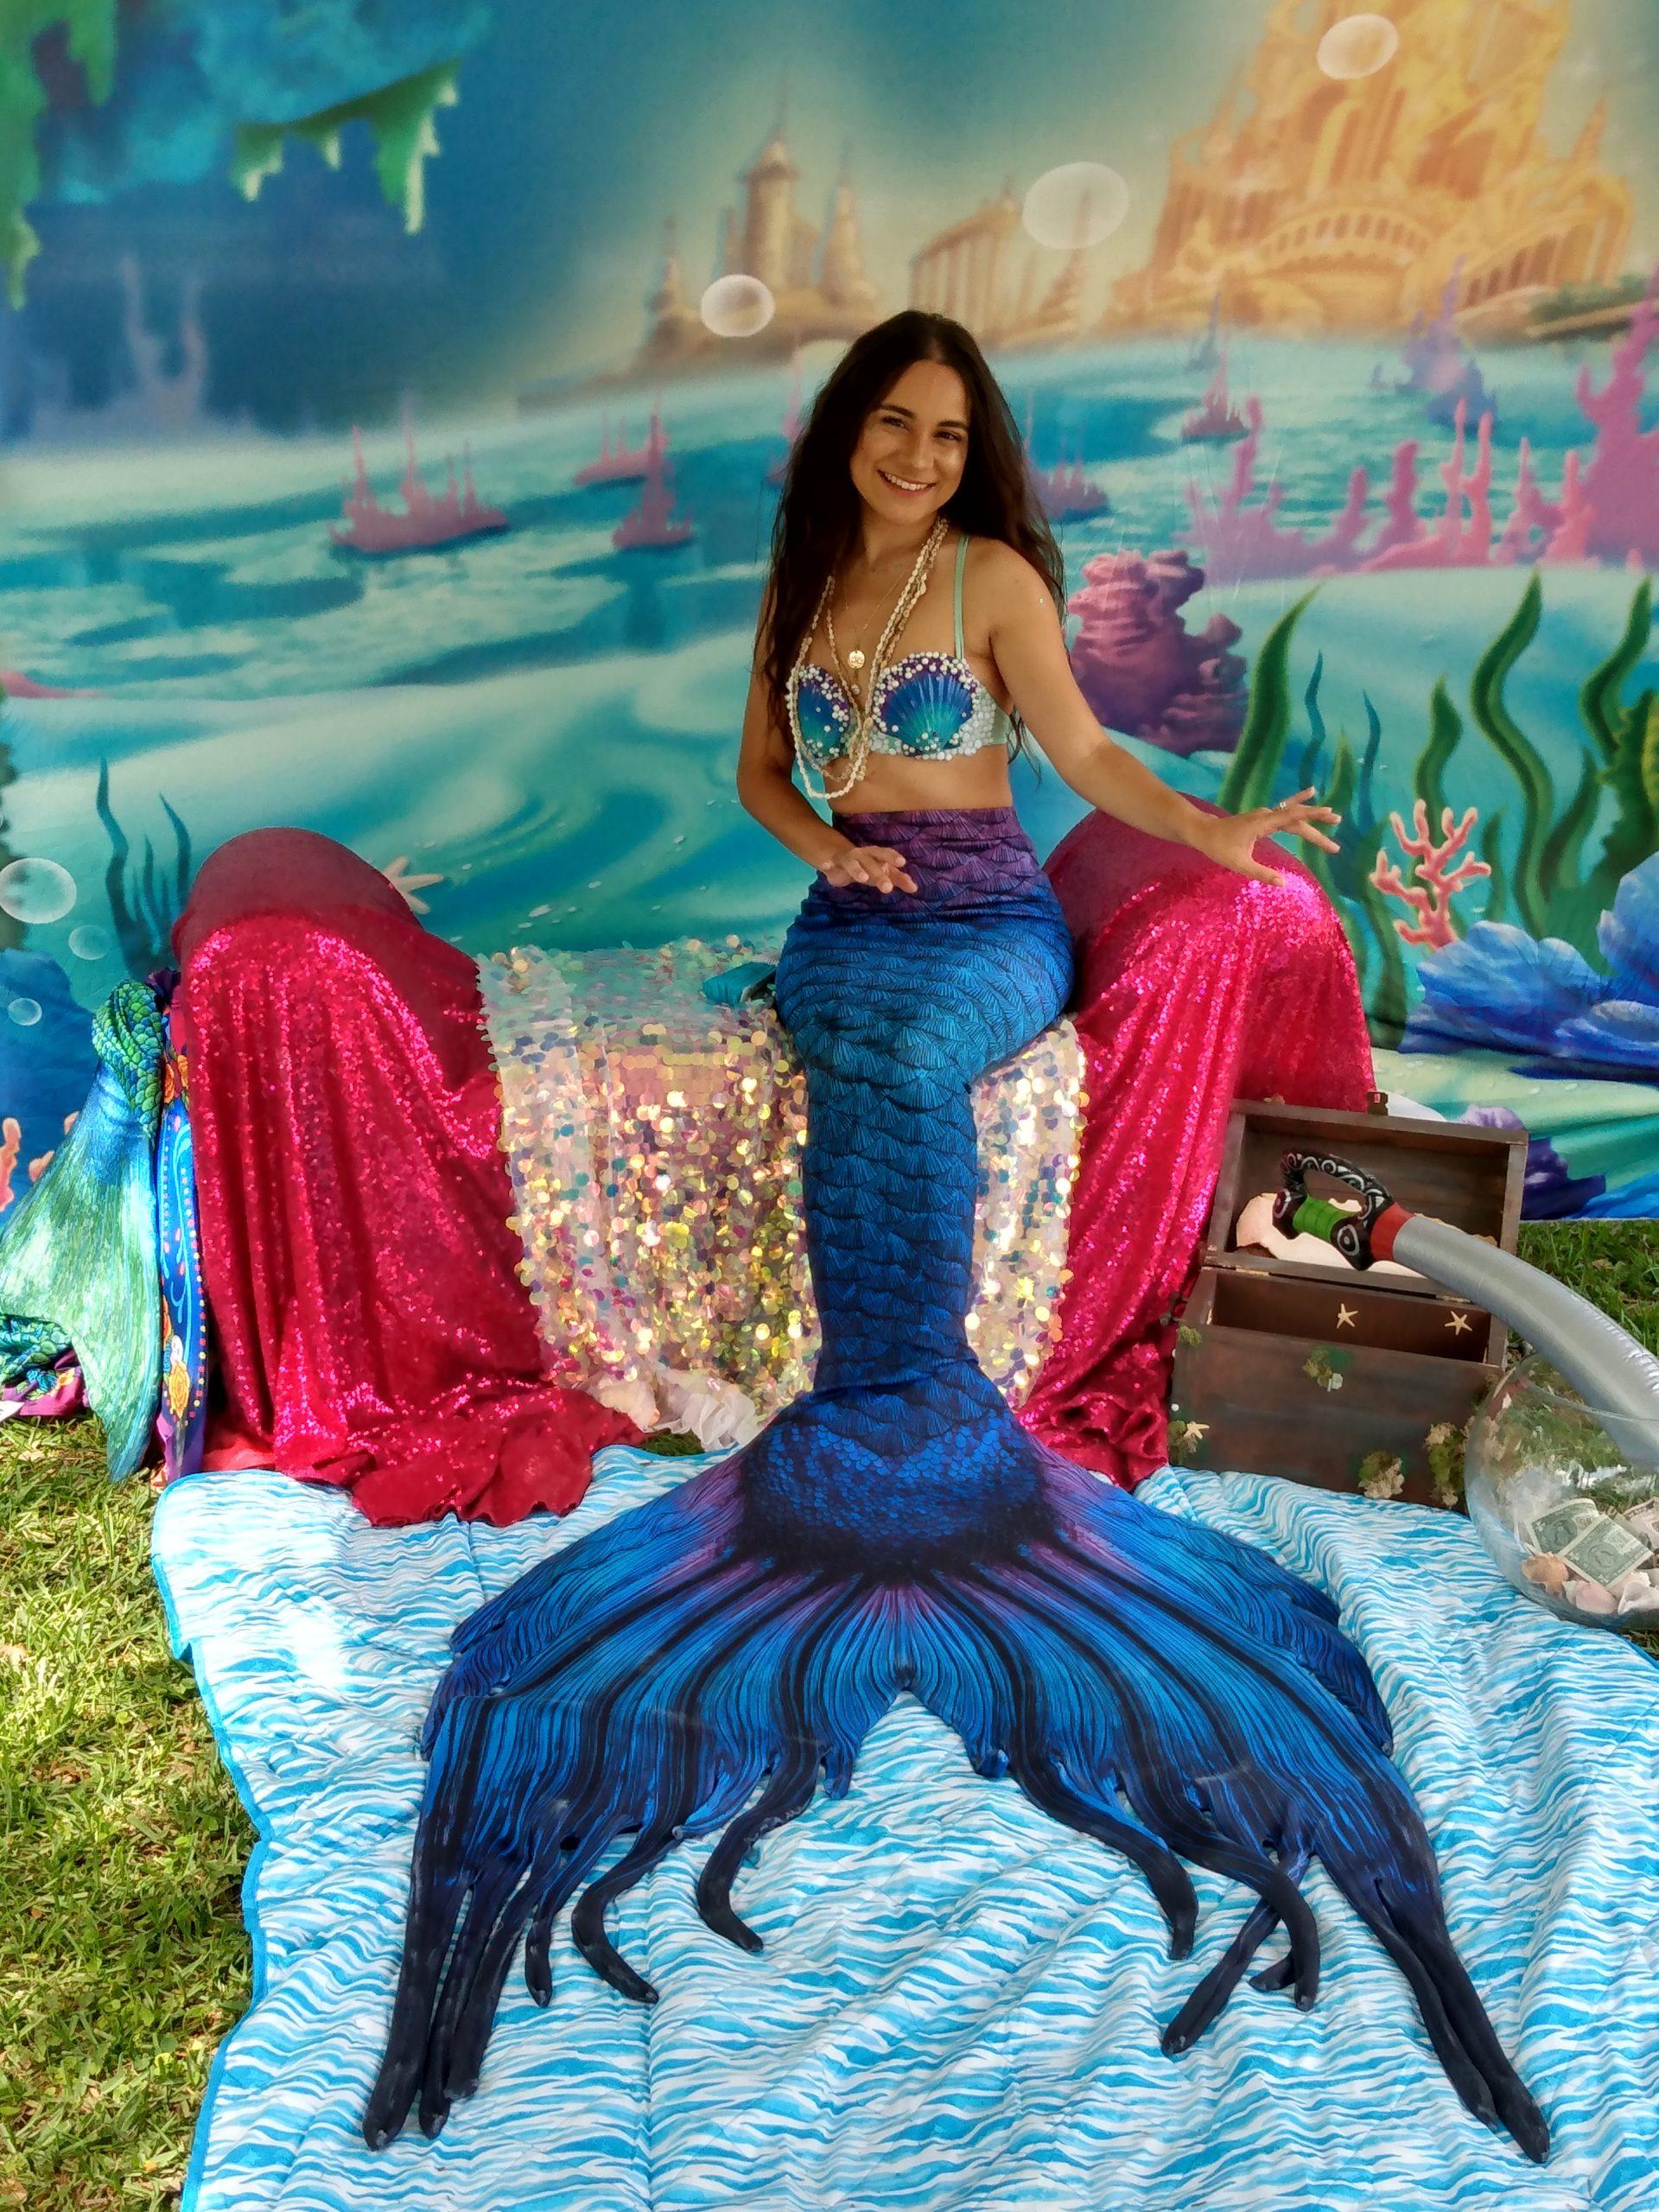 VERO BEACH PIRATE AND CARIBBEAN FESTIVAL